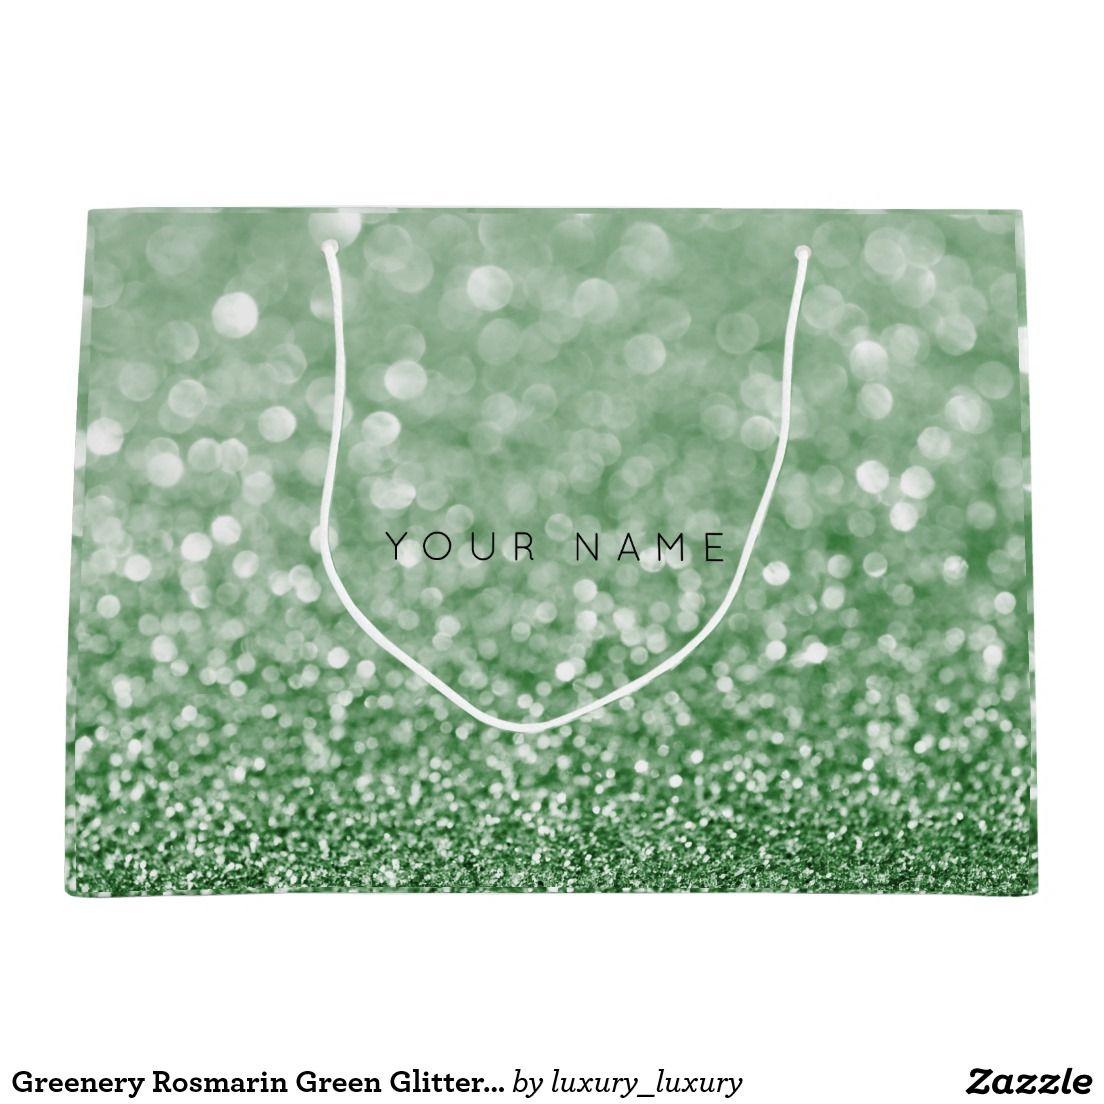 Greenery Rosmarin Green Glitter Favor Gift Bag